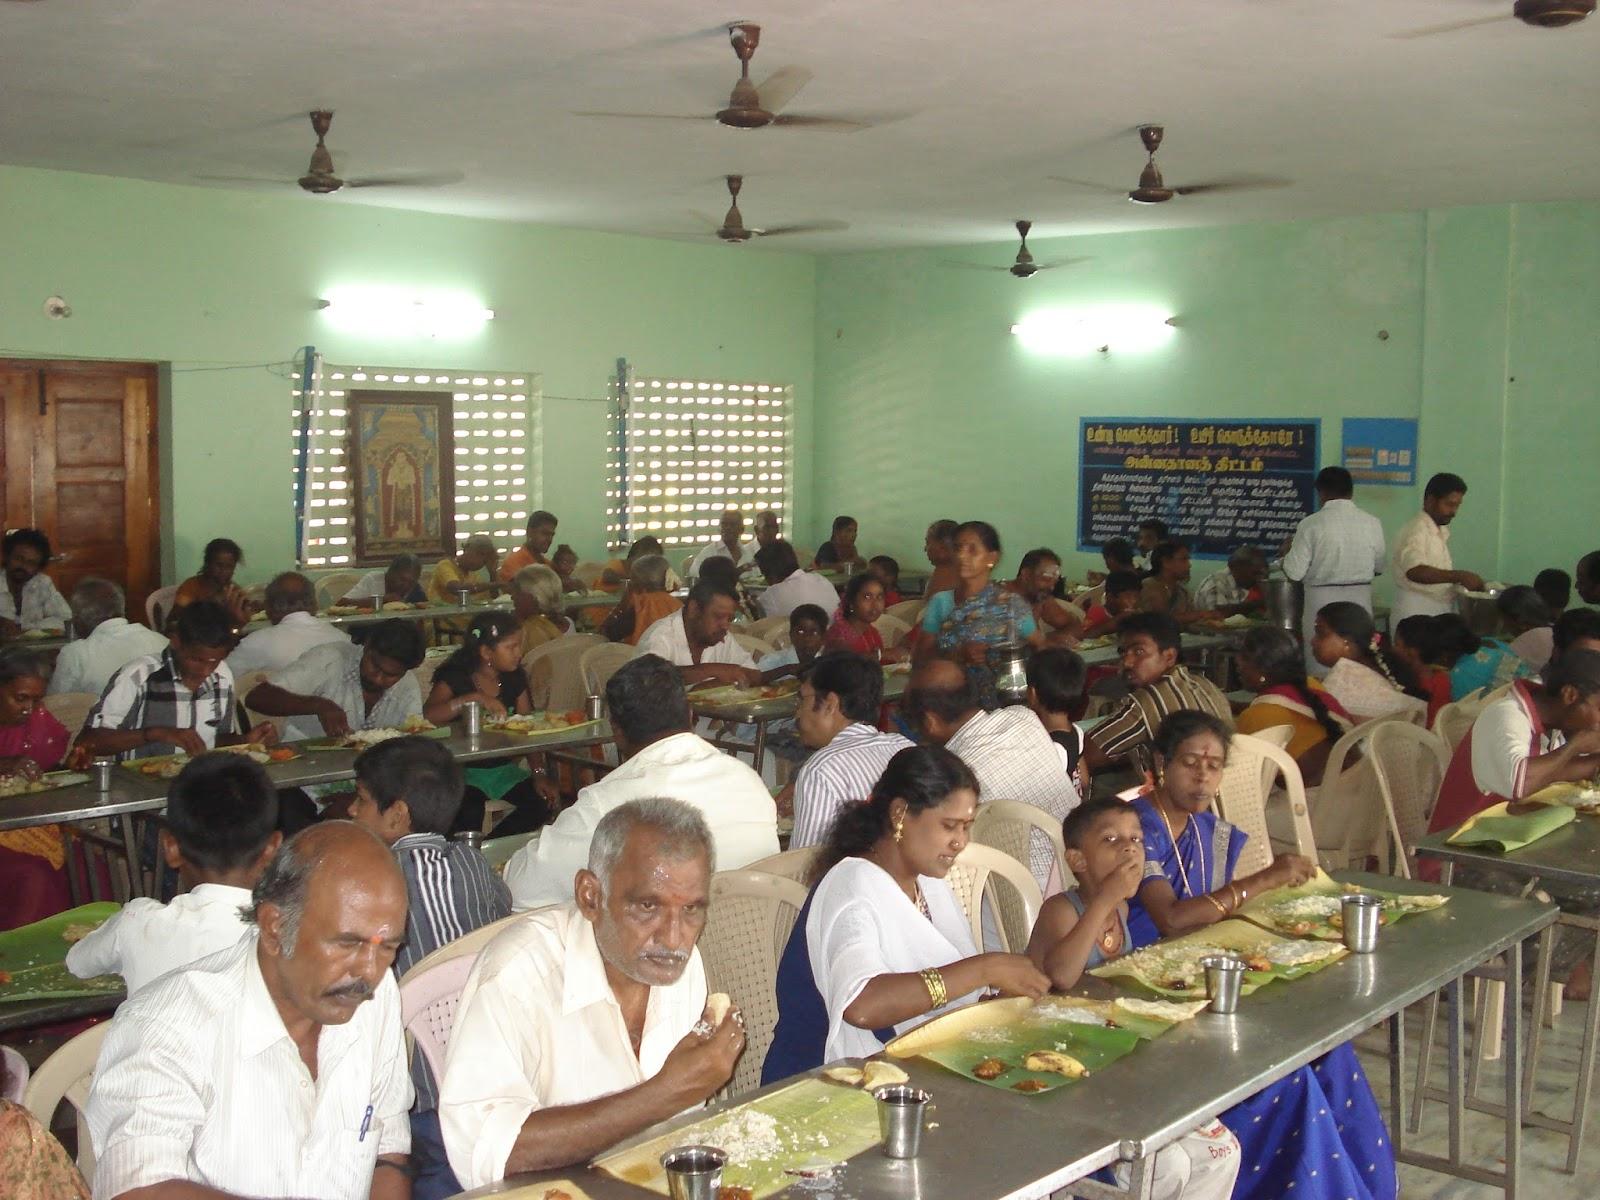 South Indian Temples: Sri Garbarakshambigai Sameta Shri